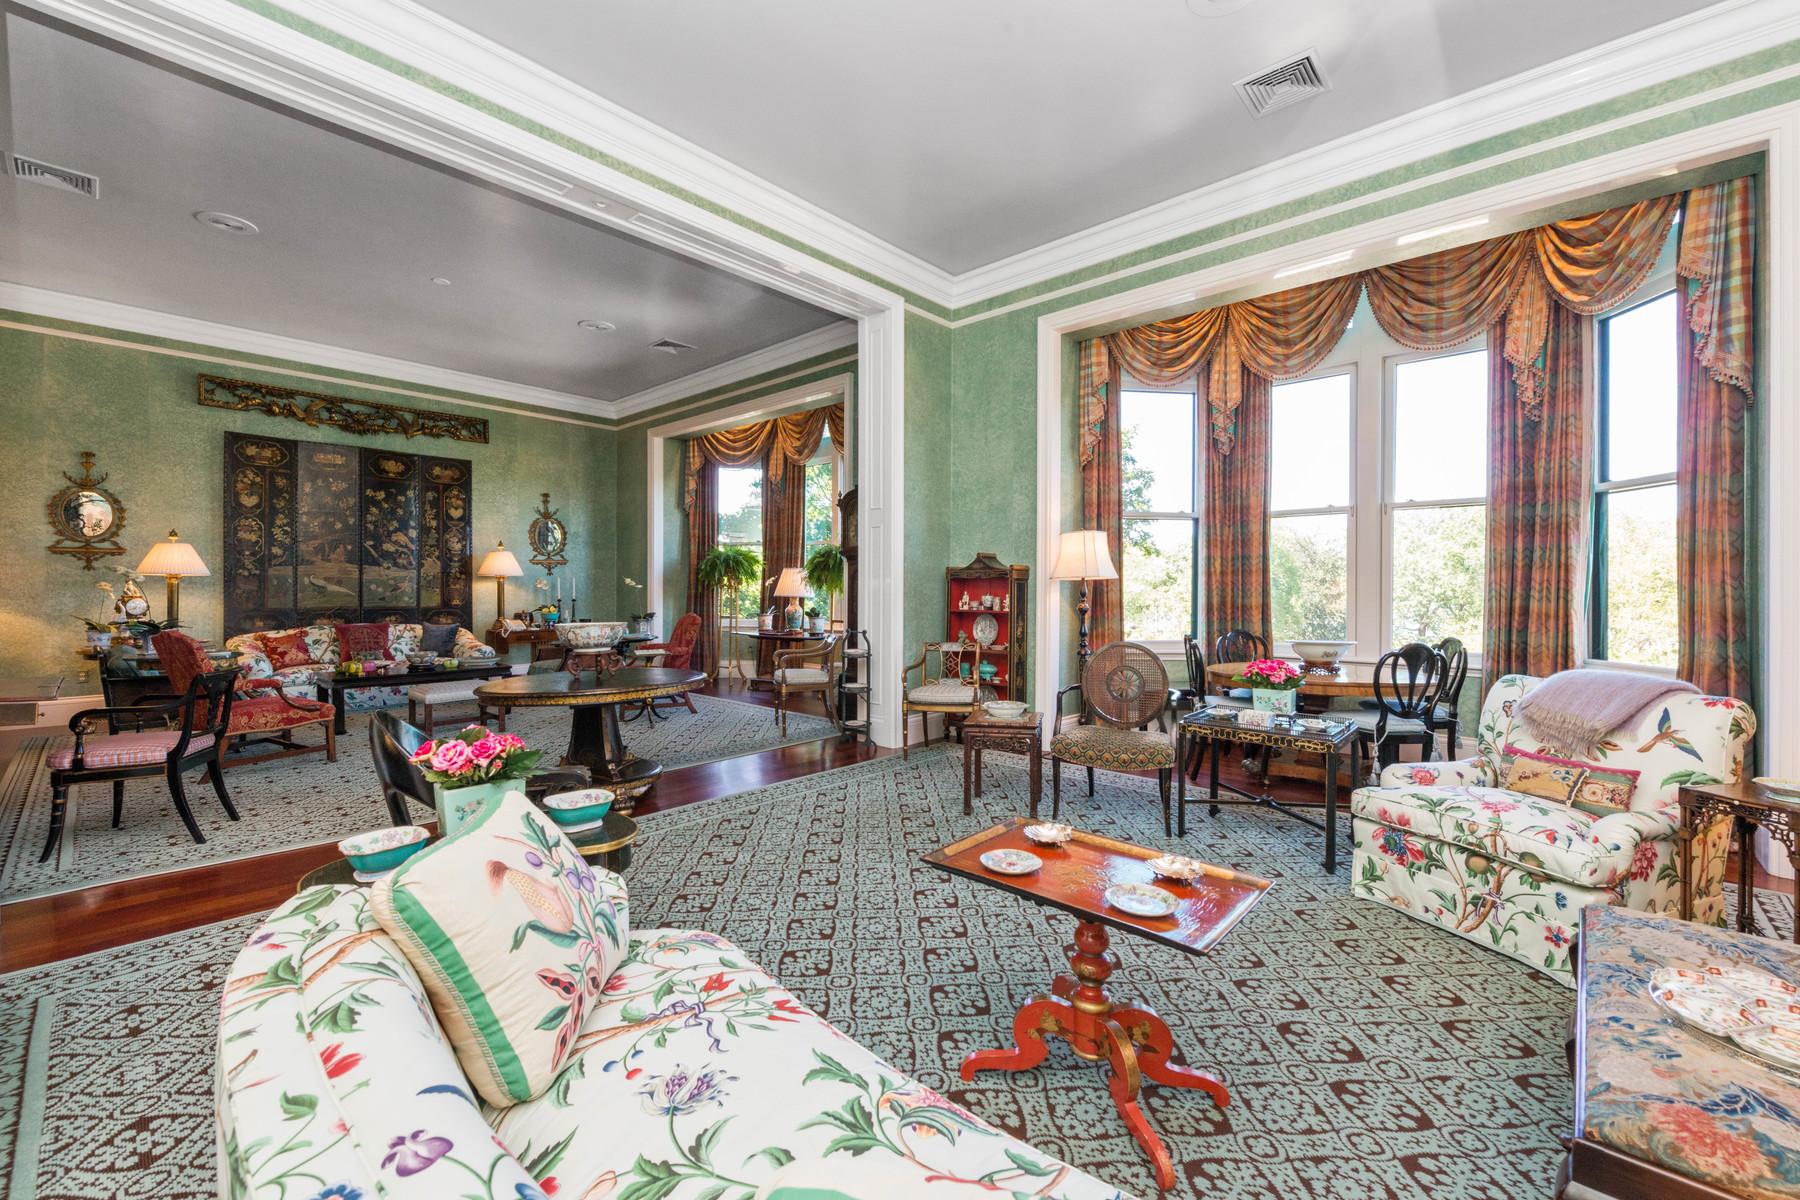 Additional photo for property listing at 200-202 beacon #1 & 3  Boston, Massachusetts 02116 United States